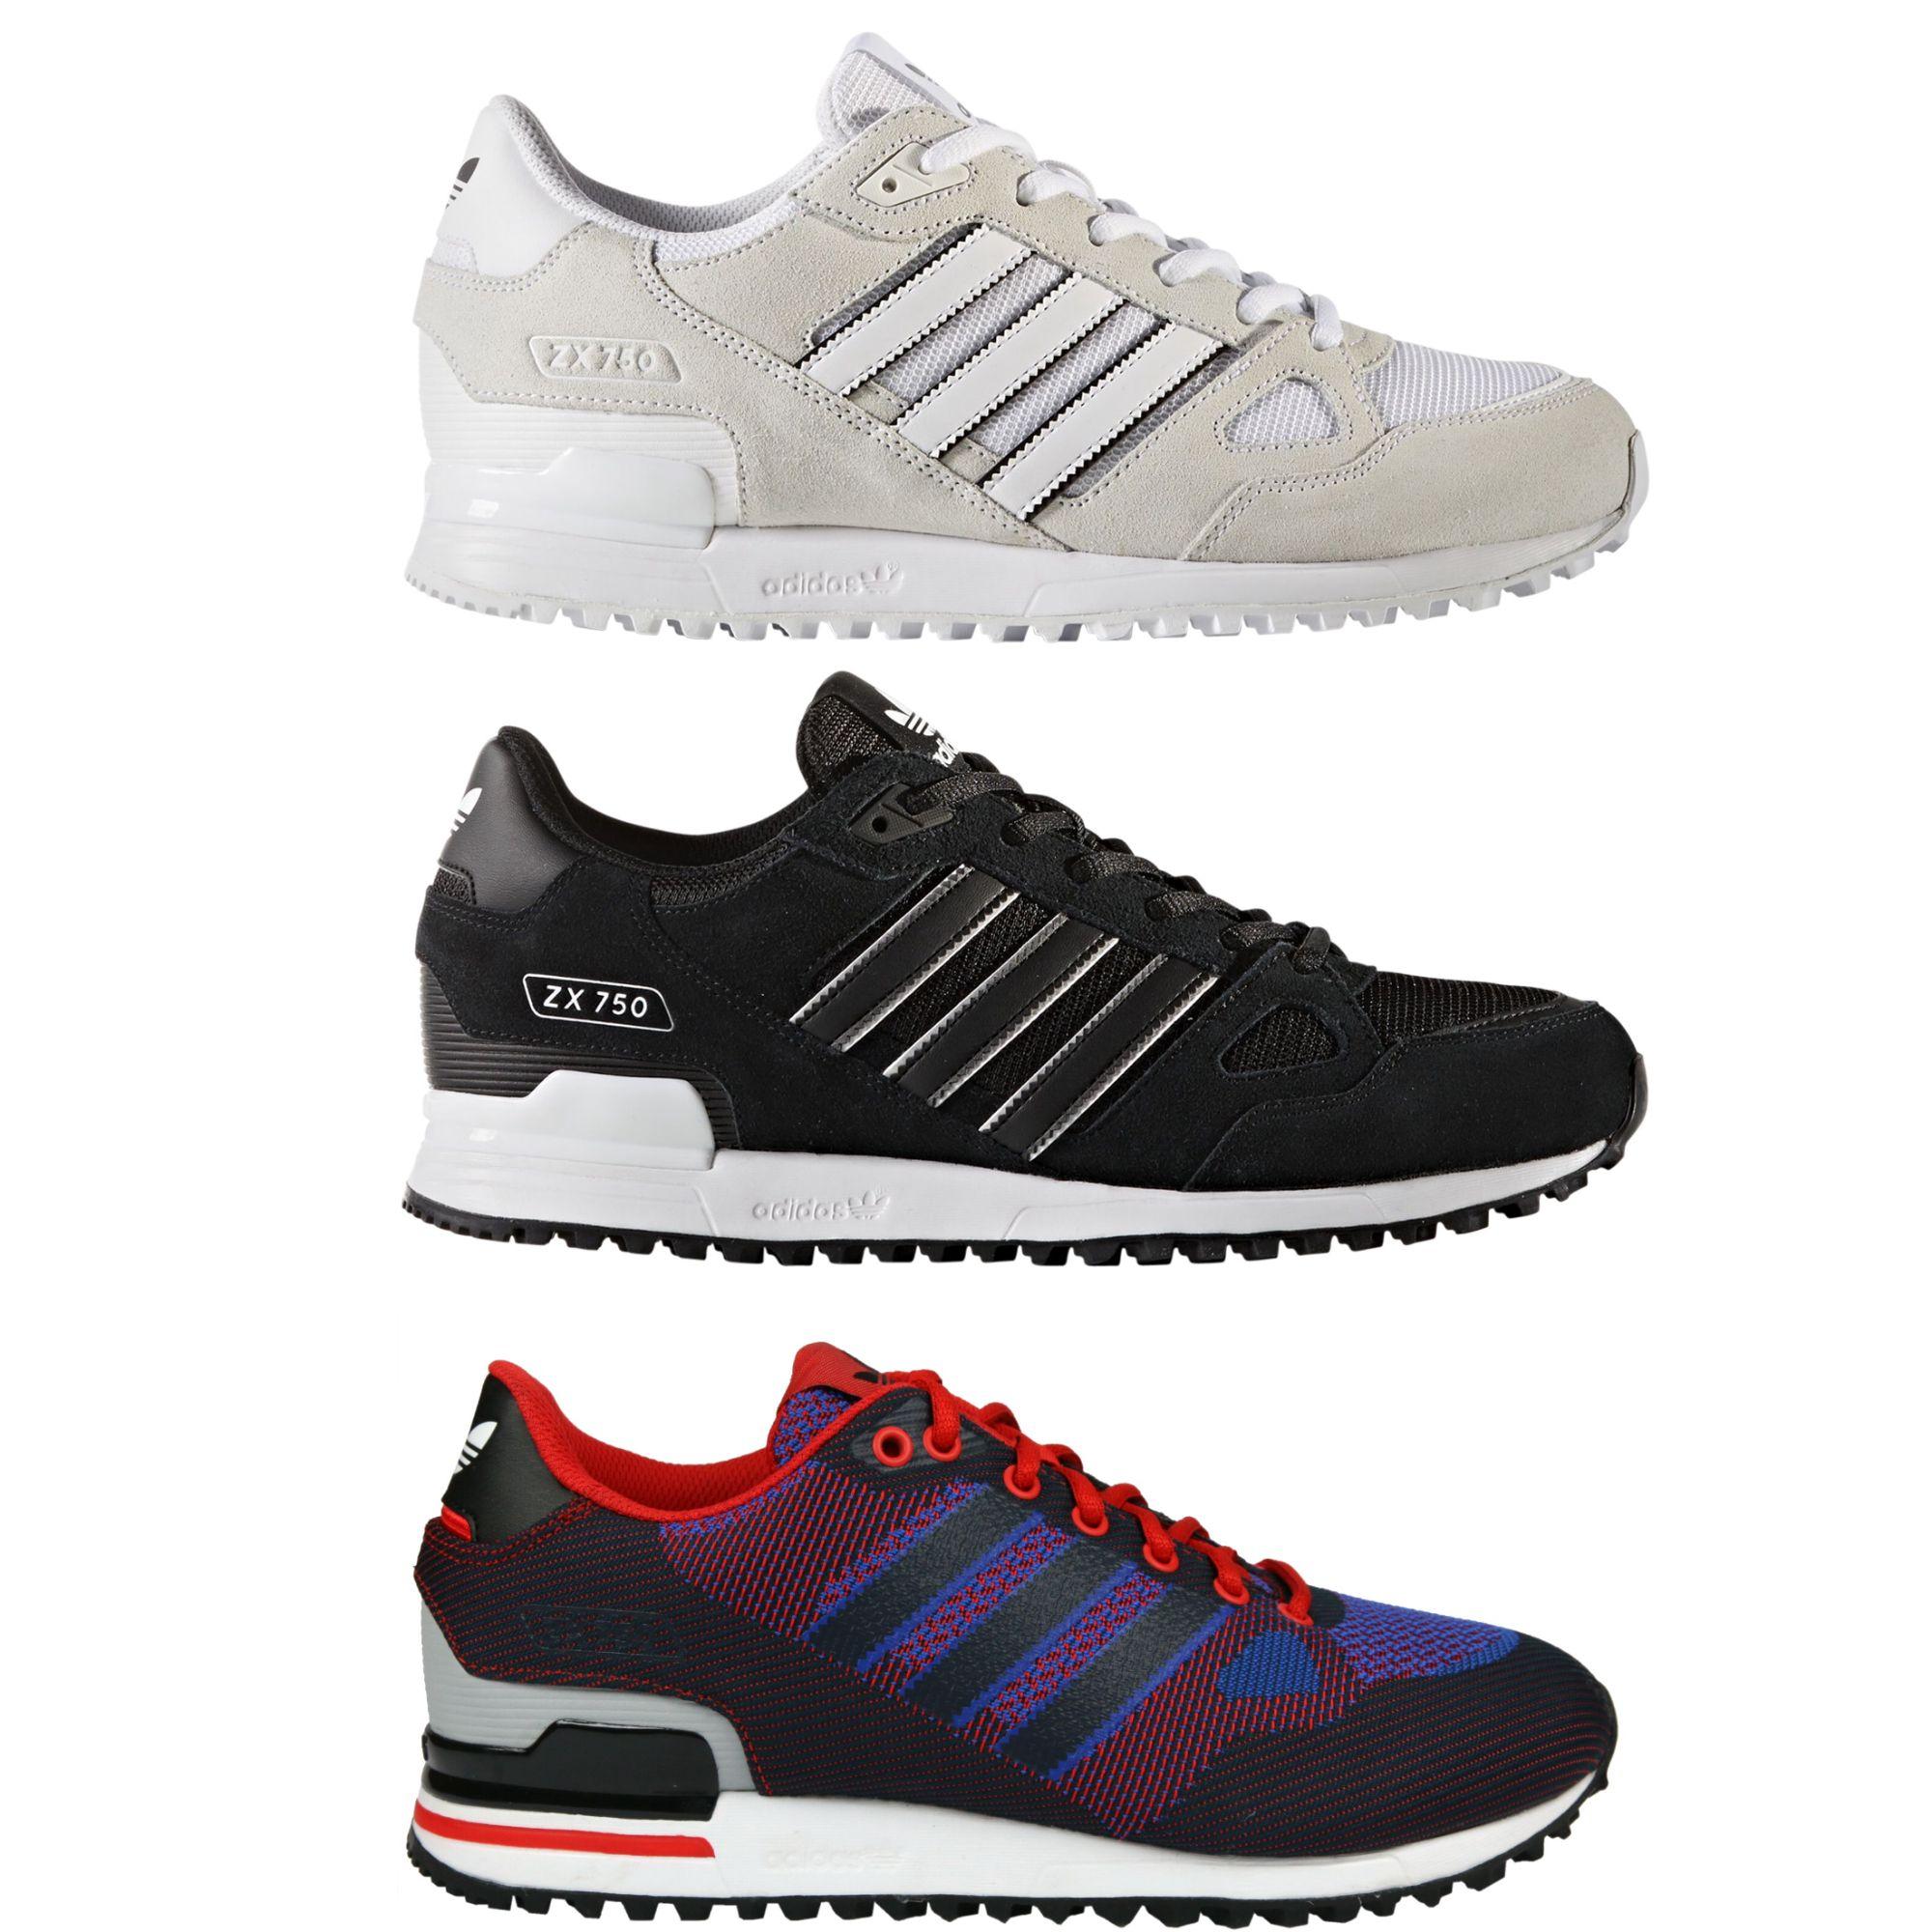 adidas originals zx 750 schuhe turnschuhe sneaker herren ebay. Black Bedroom Furniture Sets. Home Design Ideas